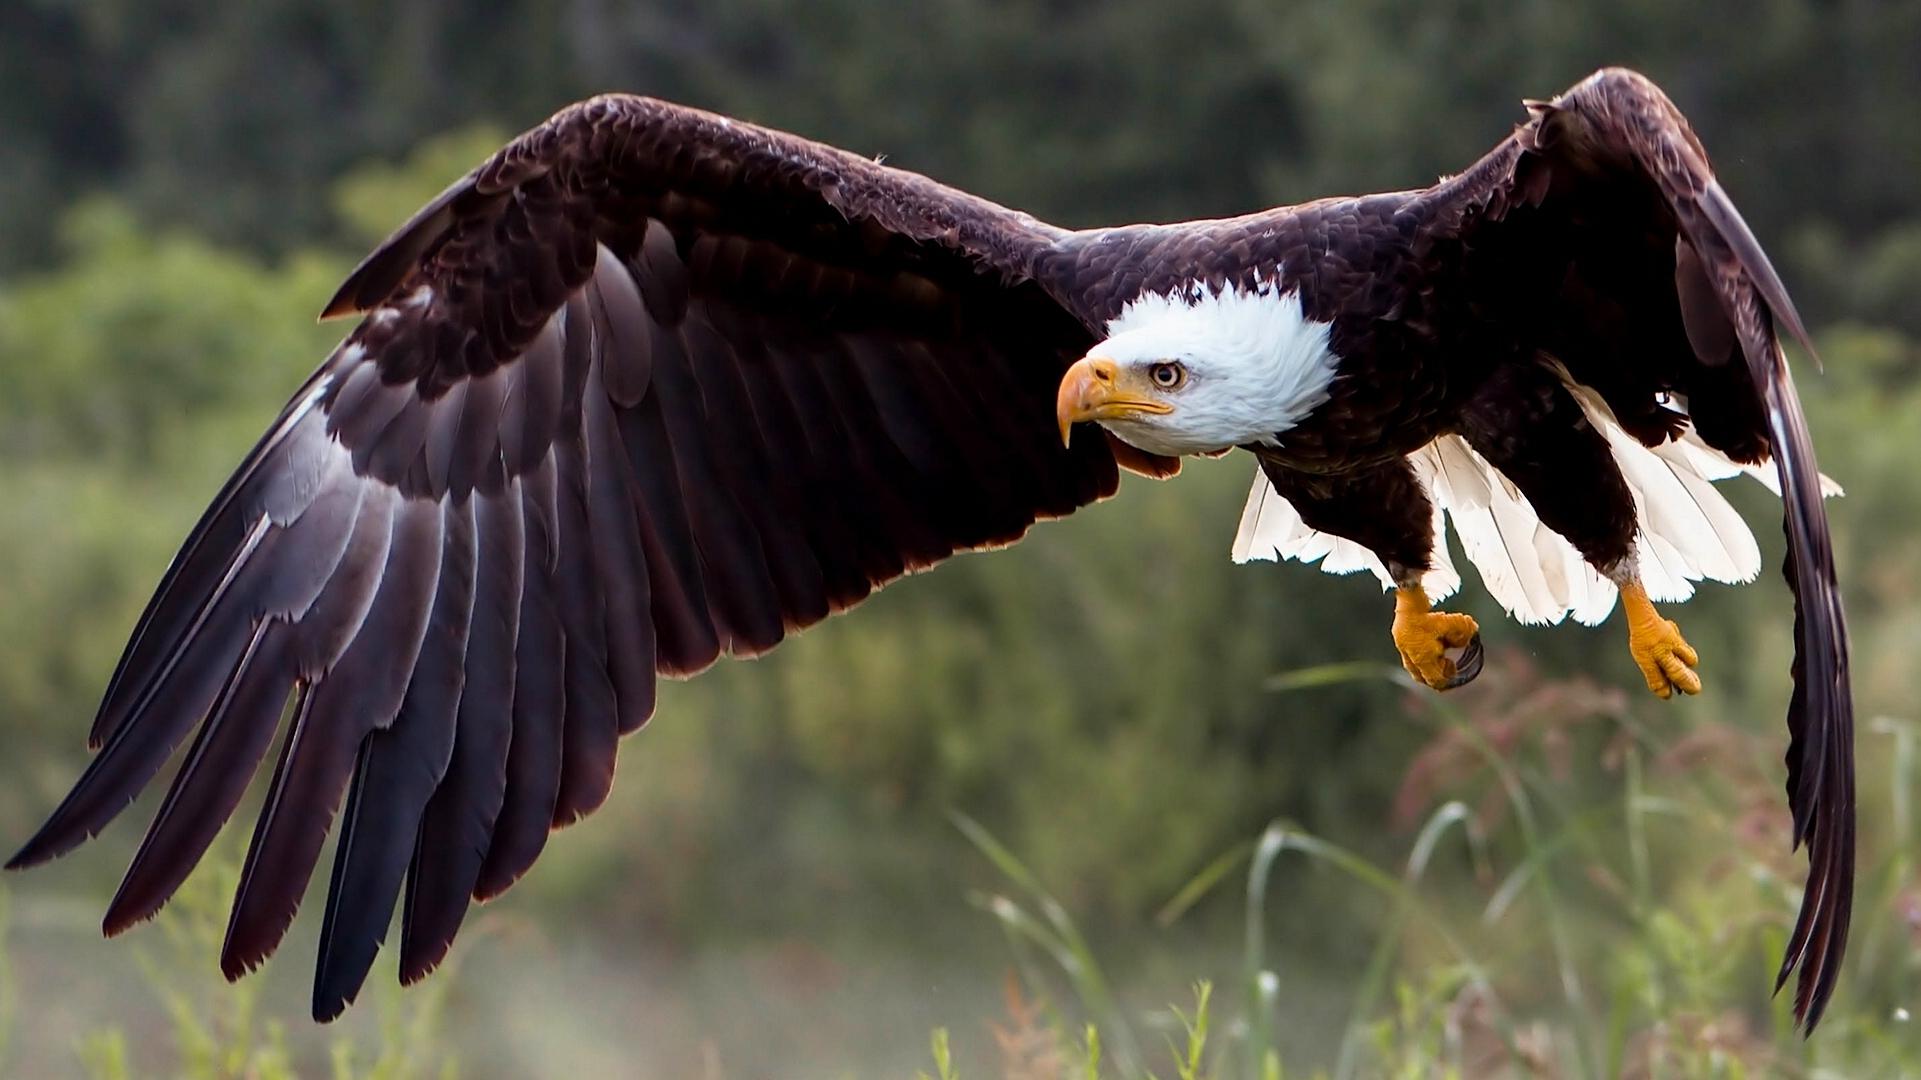 Wallpaper Bald Eagle bird Hawk Animals 1921x1080 Birds animal